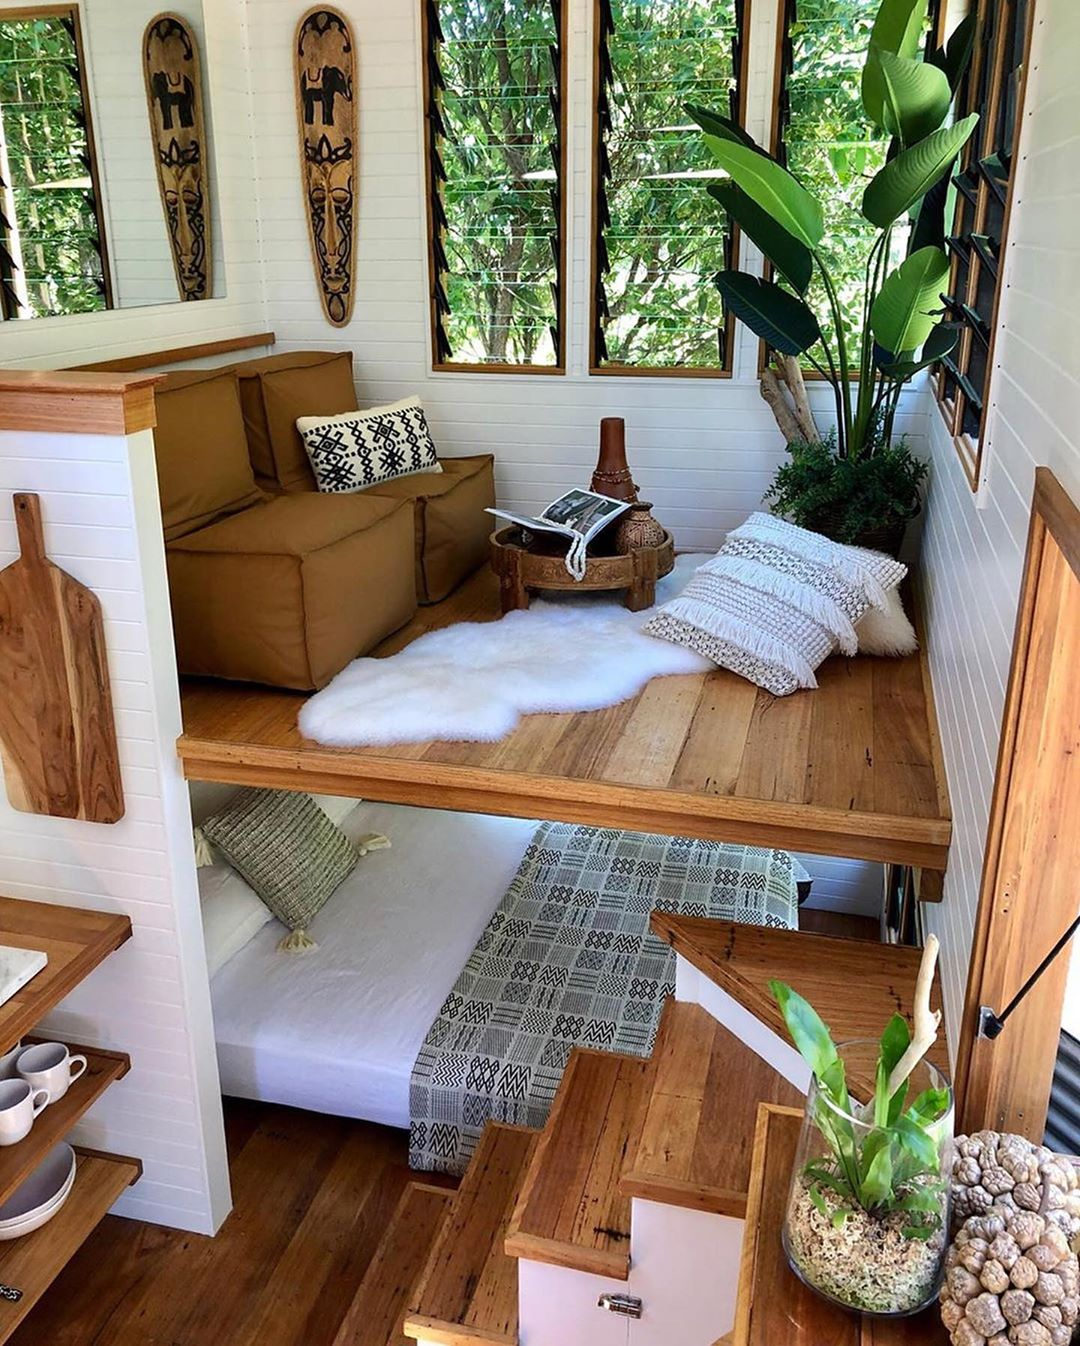 Top 6 Modern Cabin Houses We Ve Seen This Season